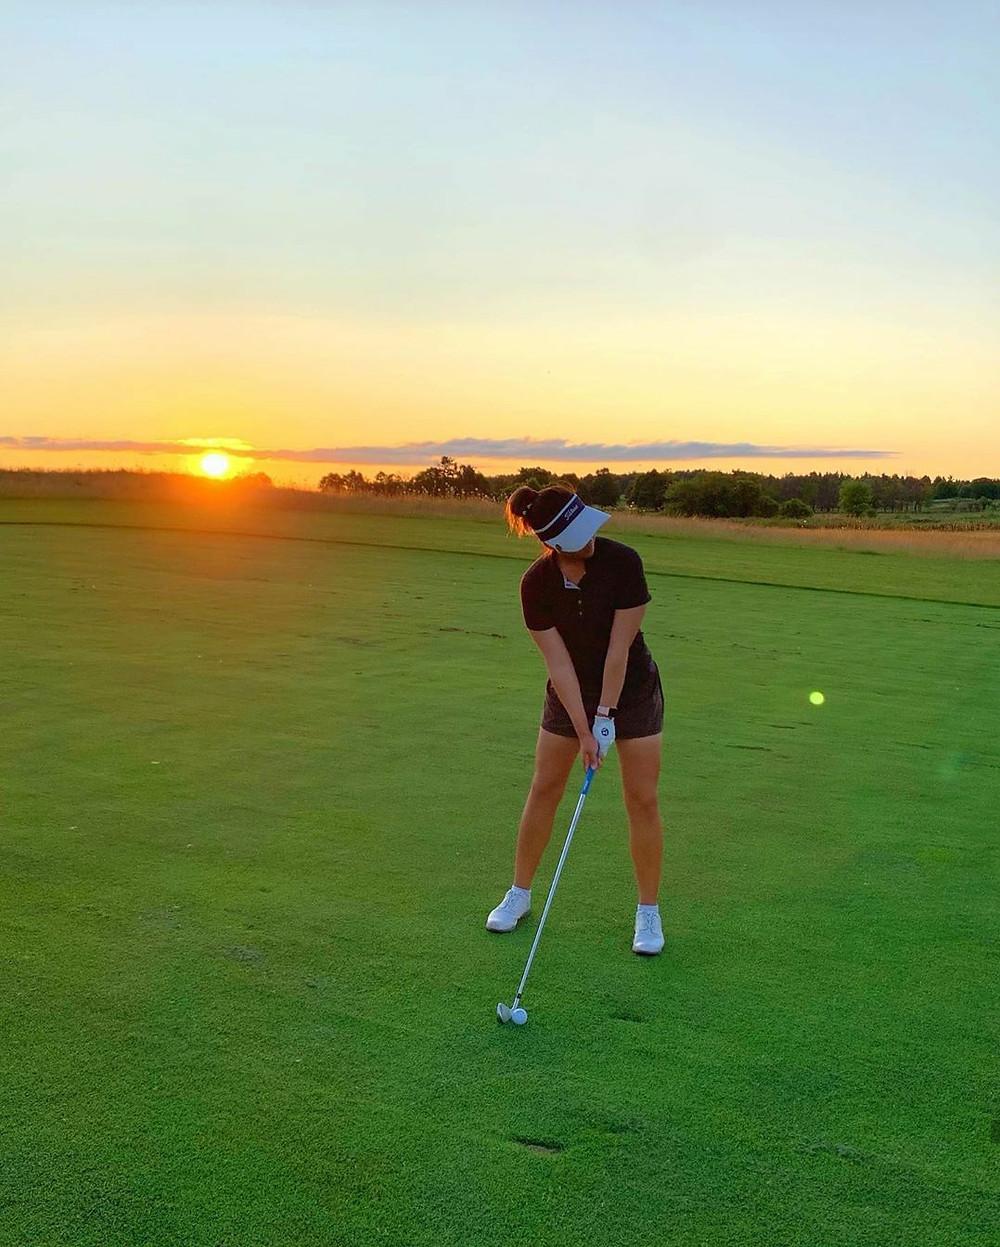 Sunset, golf, Rebecca Lee-Bentham, taking dead aim for a professional golf career